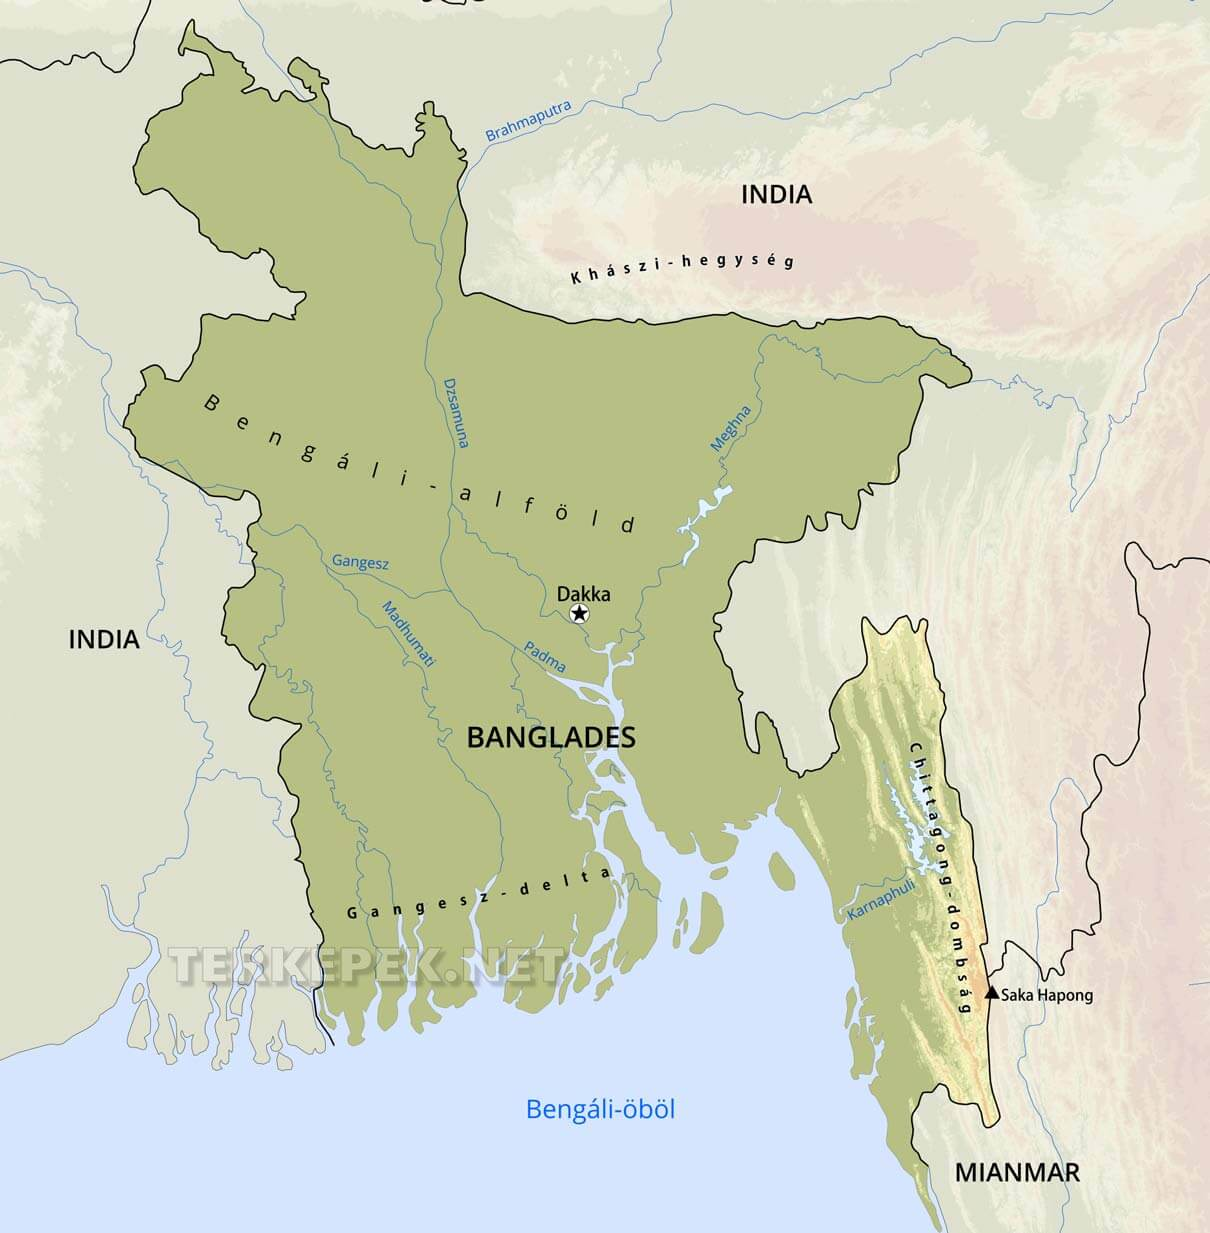 india domborzati térkép Banglades domborzati térképe india domborzati térkép